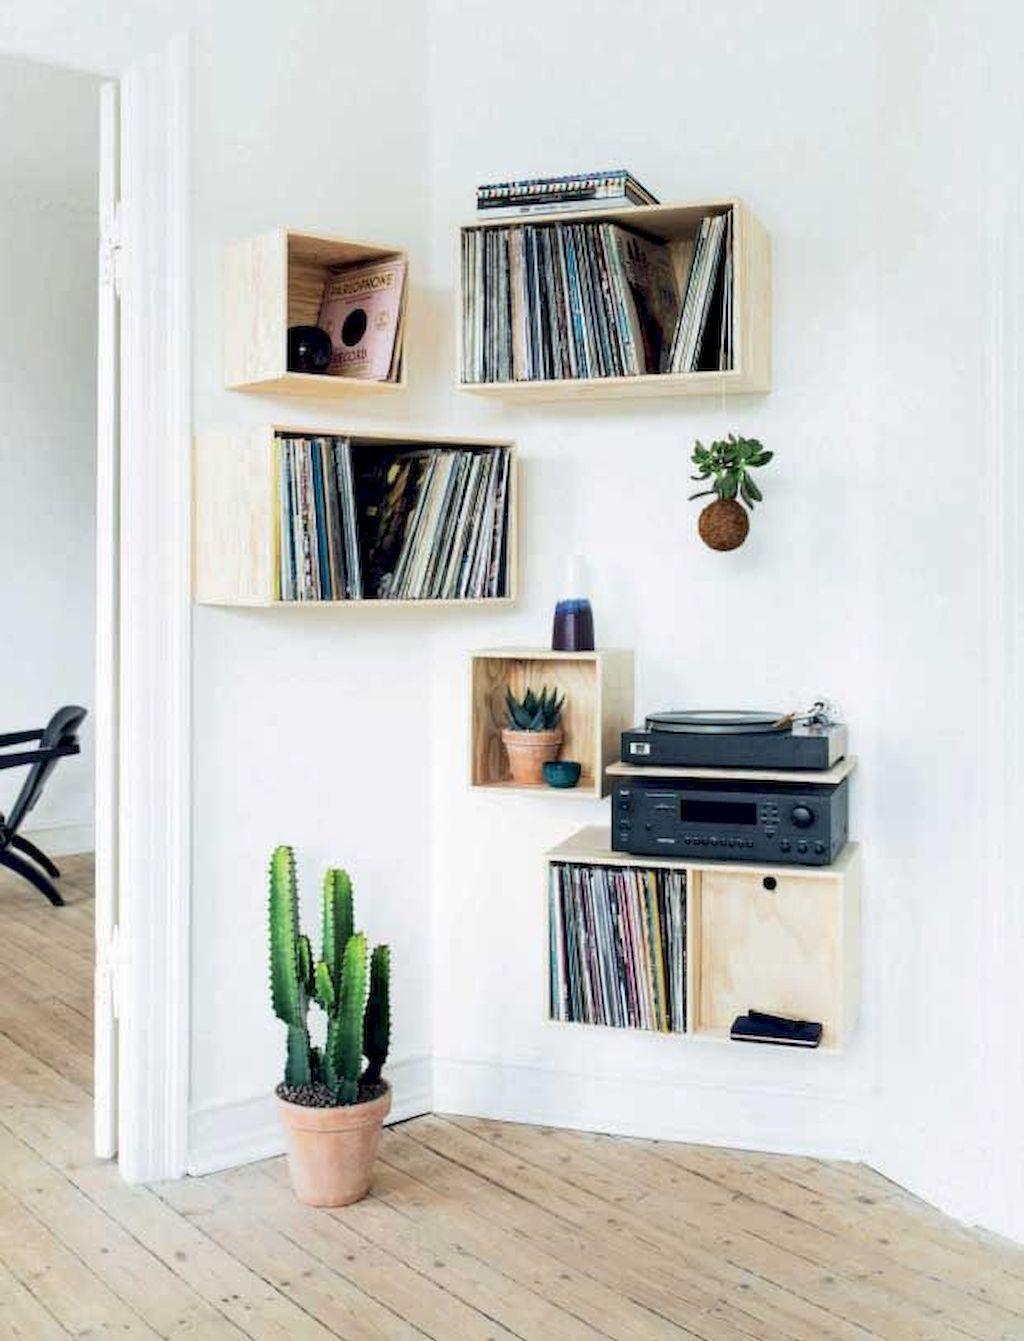 wooden decorative shelves, parted